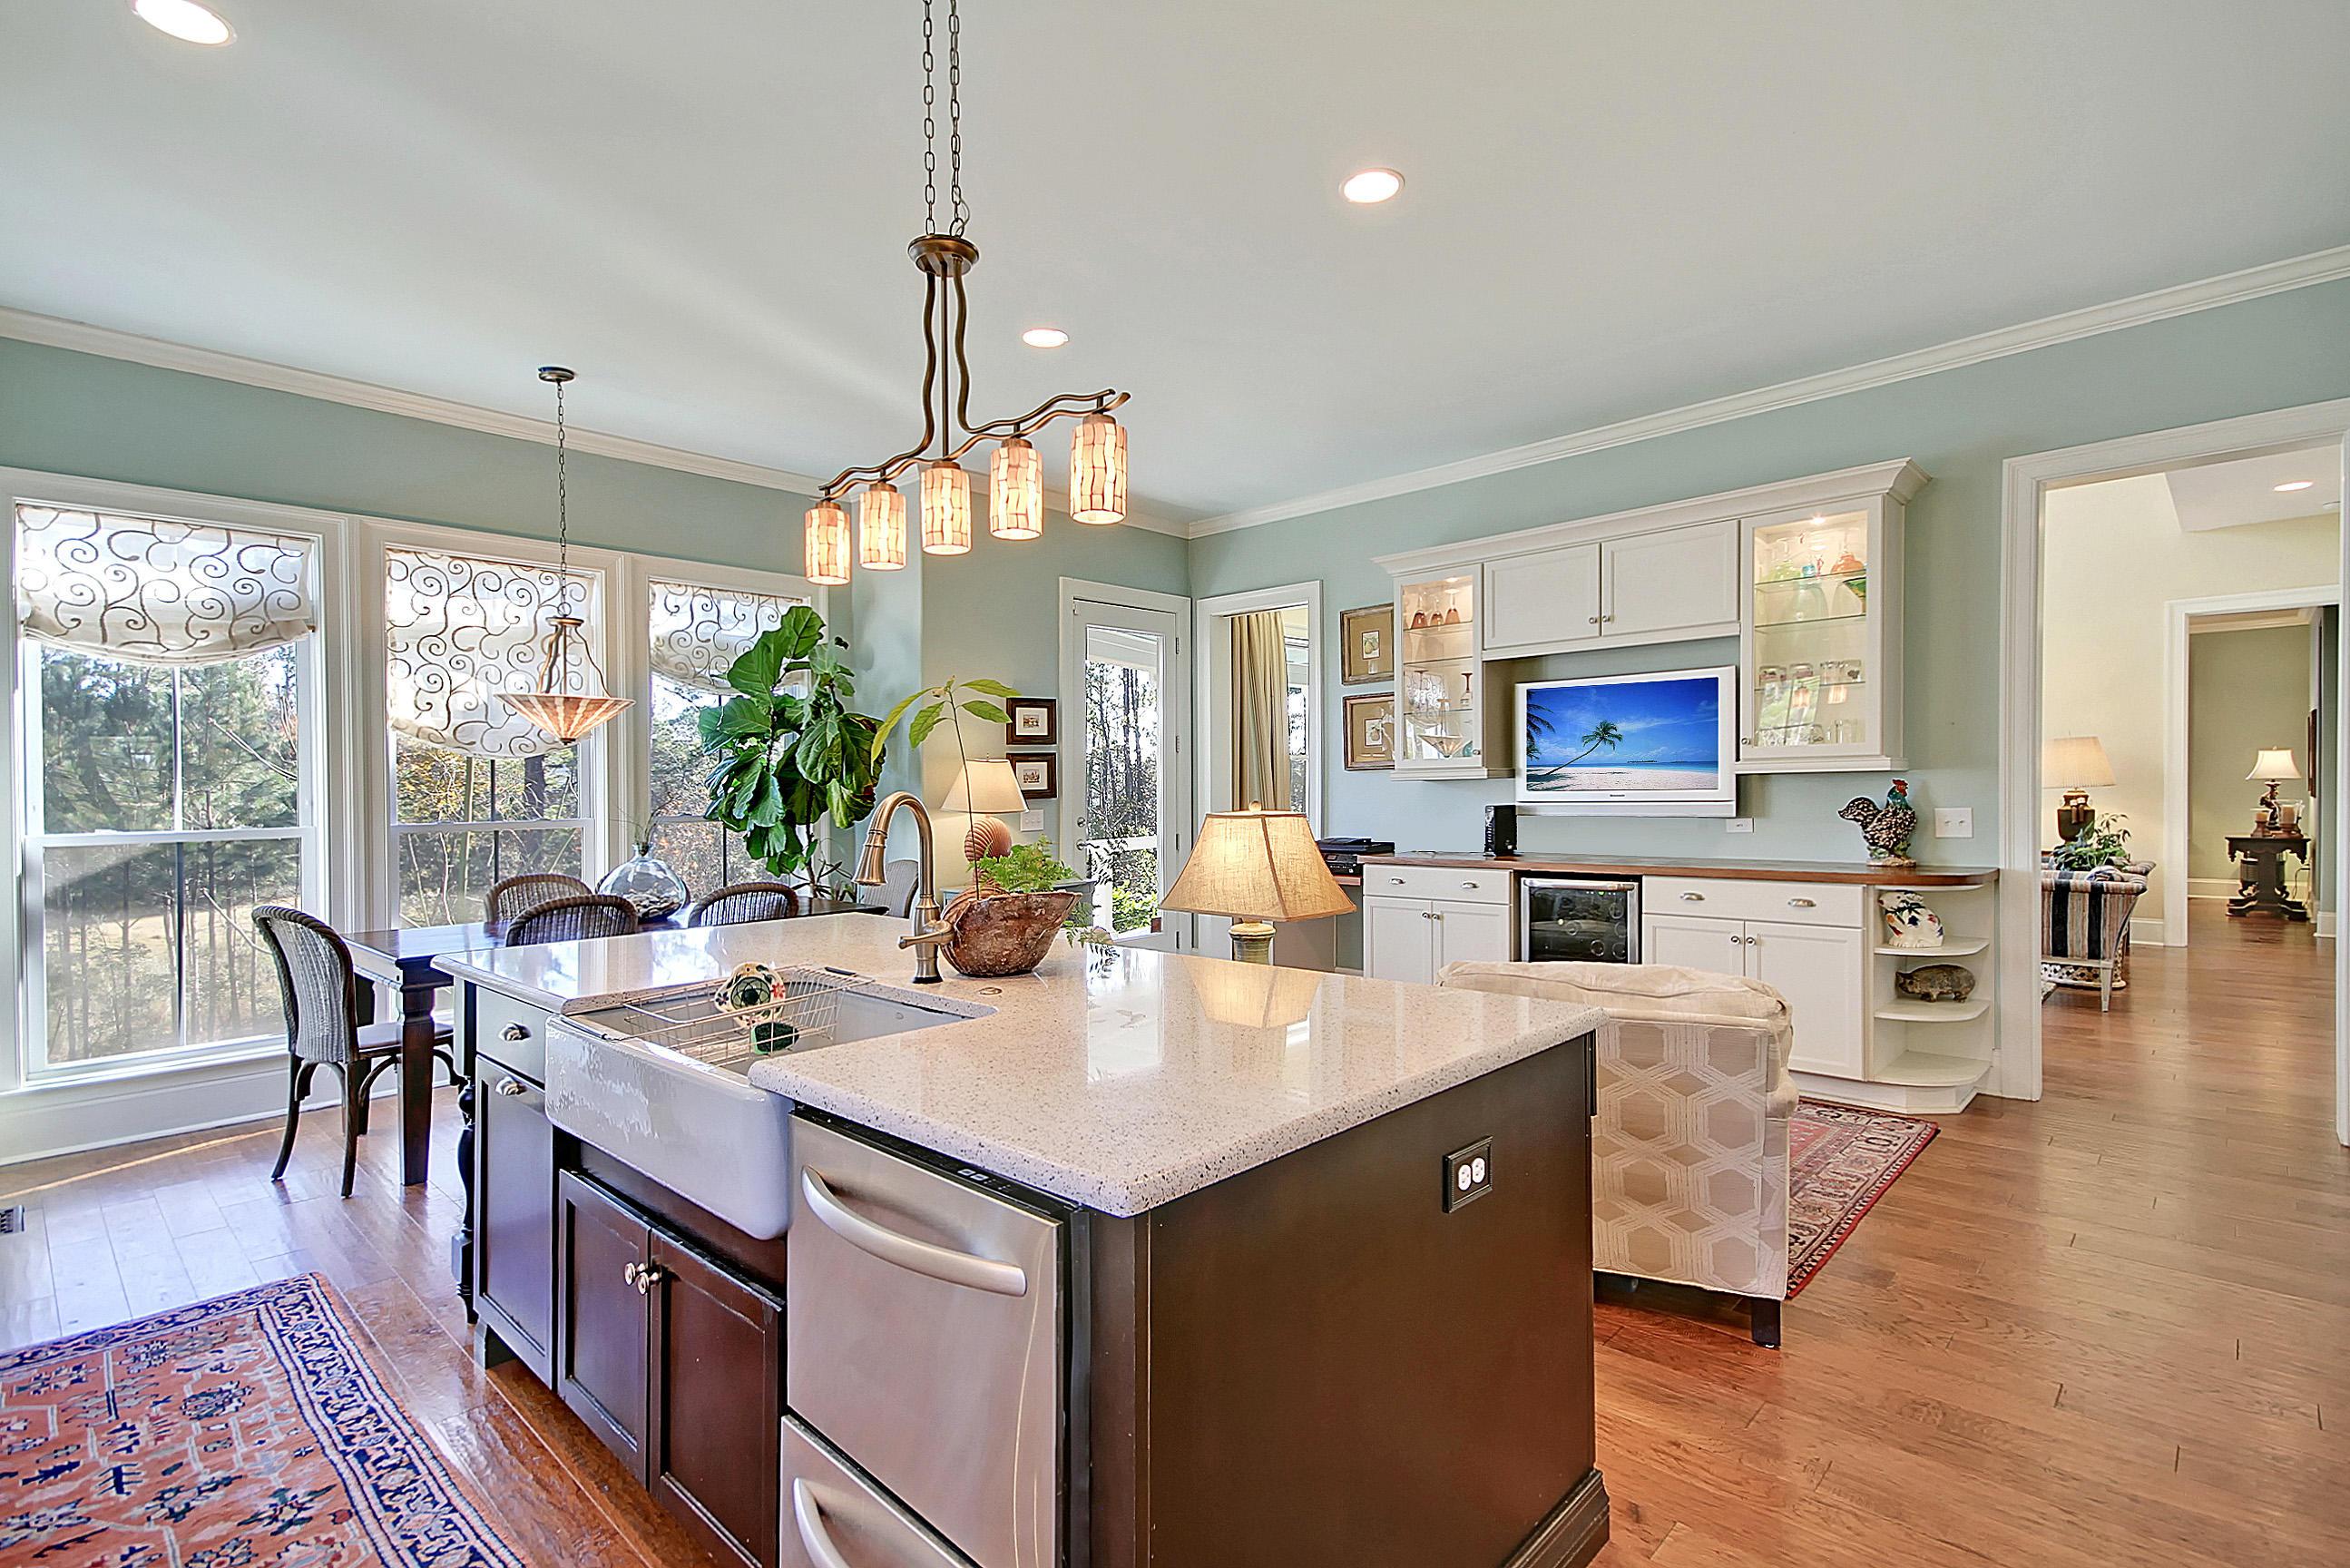 Rivertowne Country Club Homes For Sale - 2601 Kiln Creek, Mount Pleasant, SC - 3